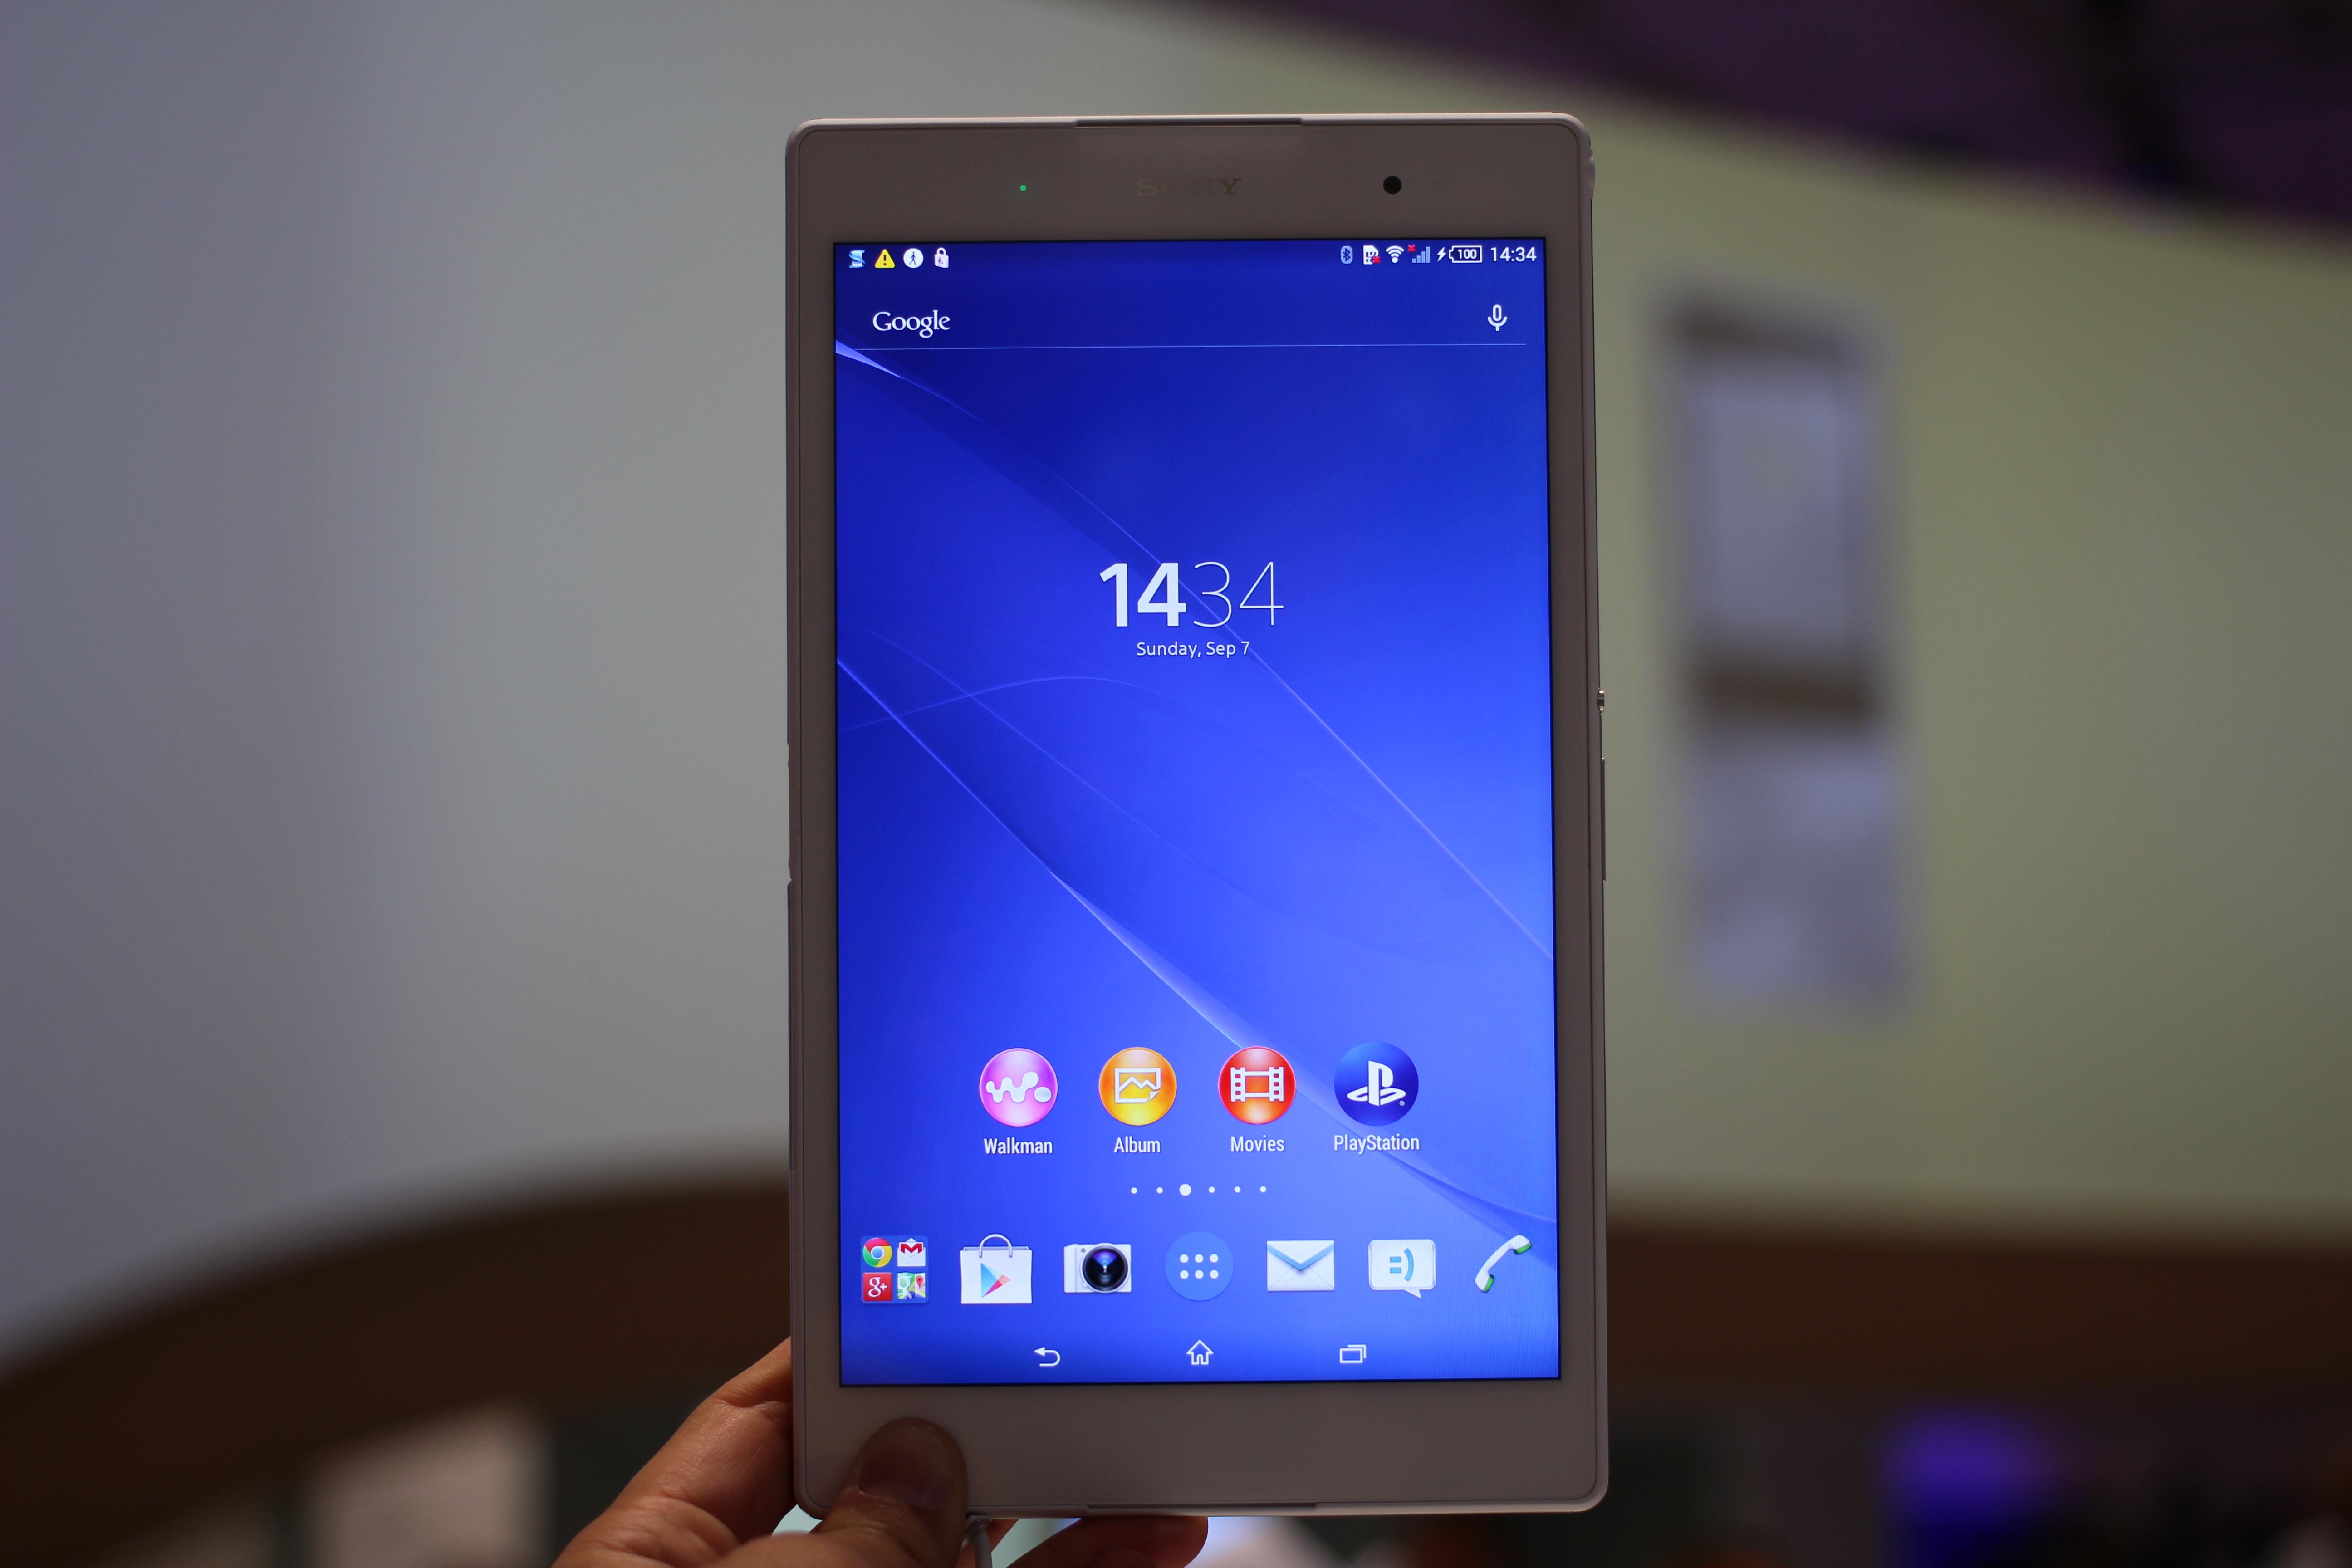 Tremendous Sony Xperia Z3 Tablet Compact Wikipedia Interior Design Ideas Grebswwsoteloinfo